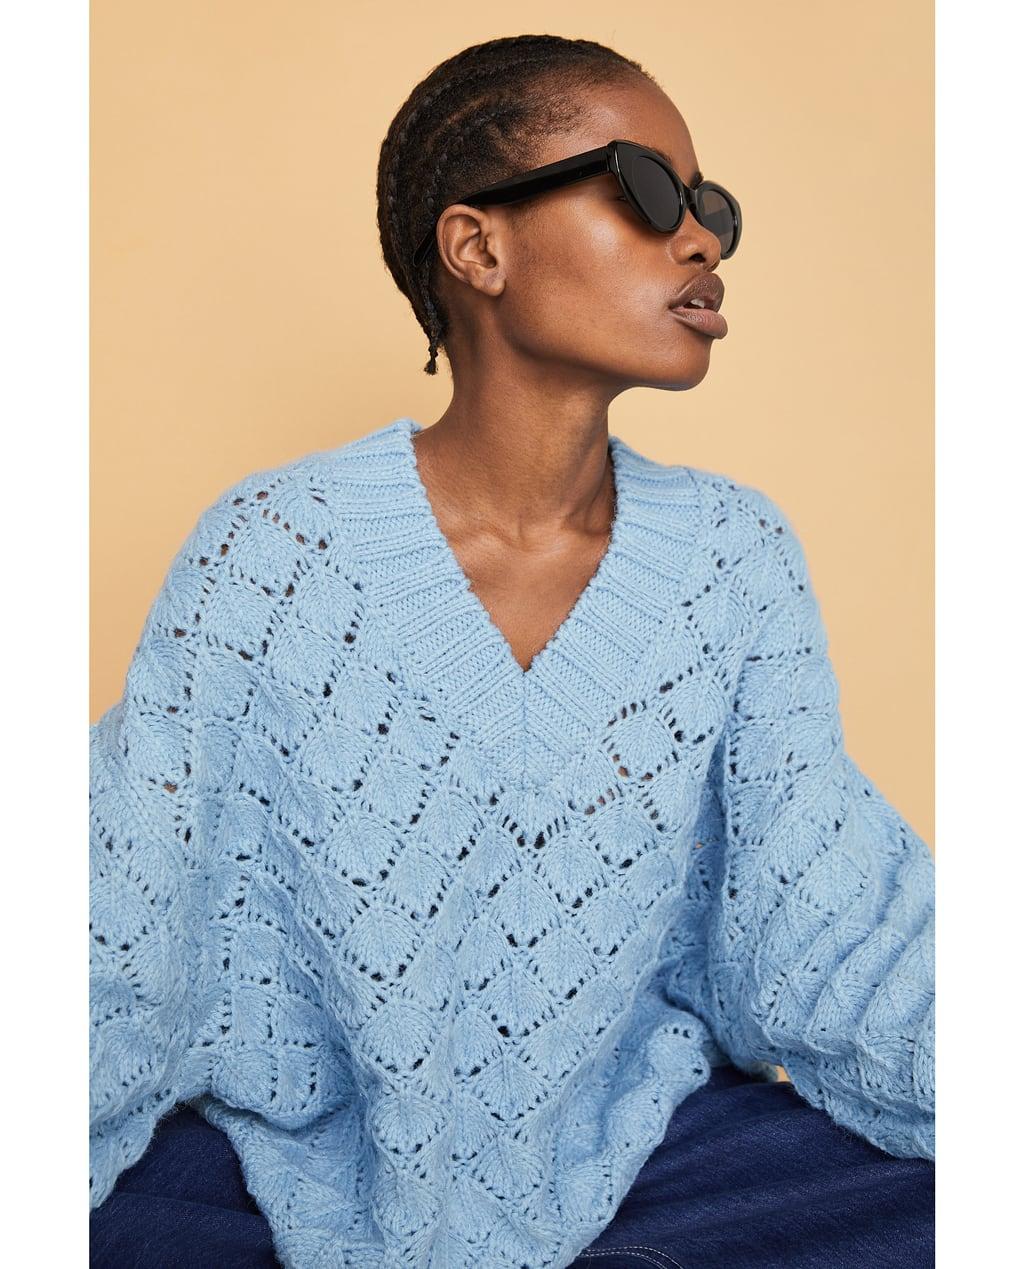 ZARA V-Neck openwork sweater $59.95